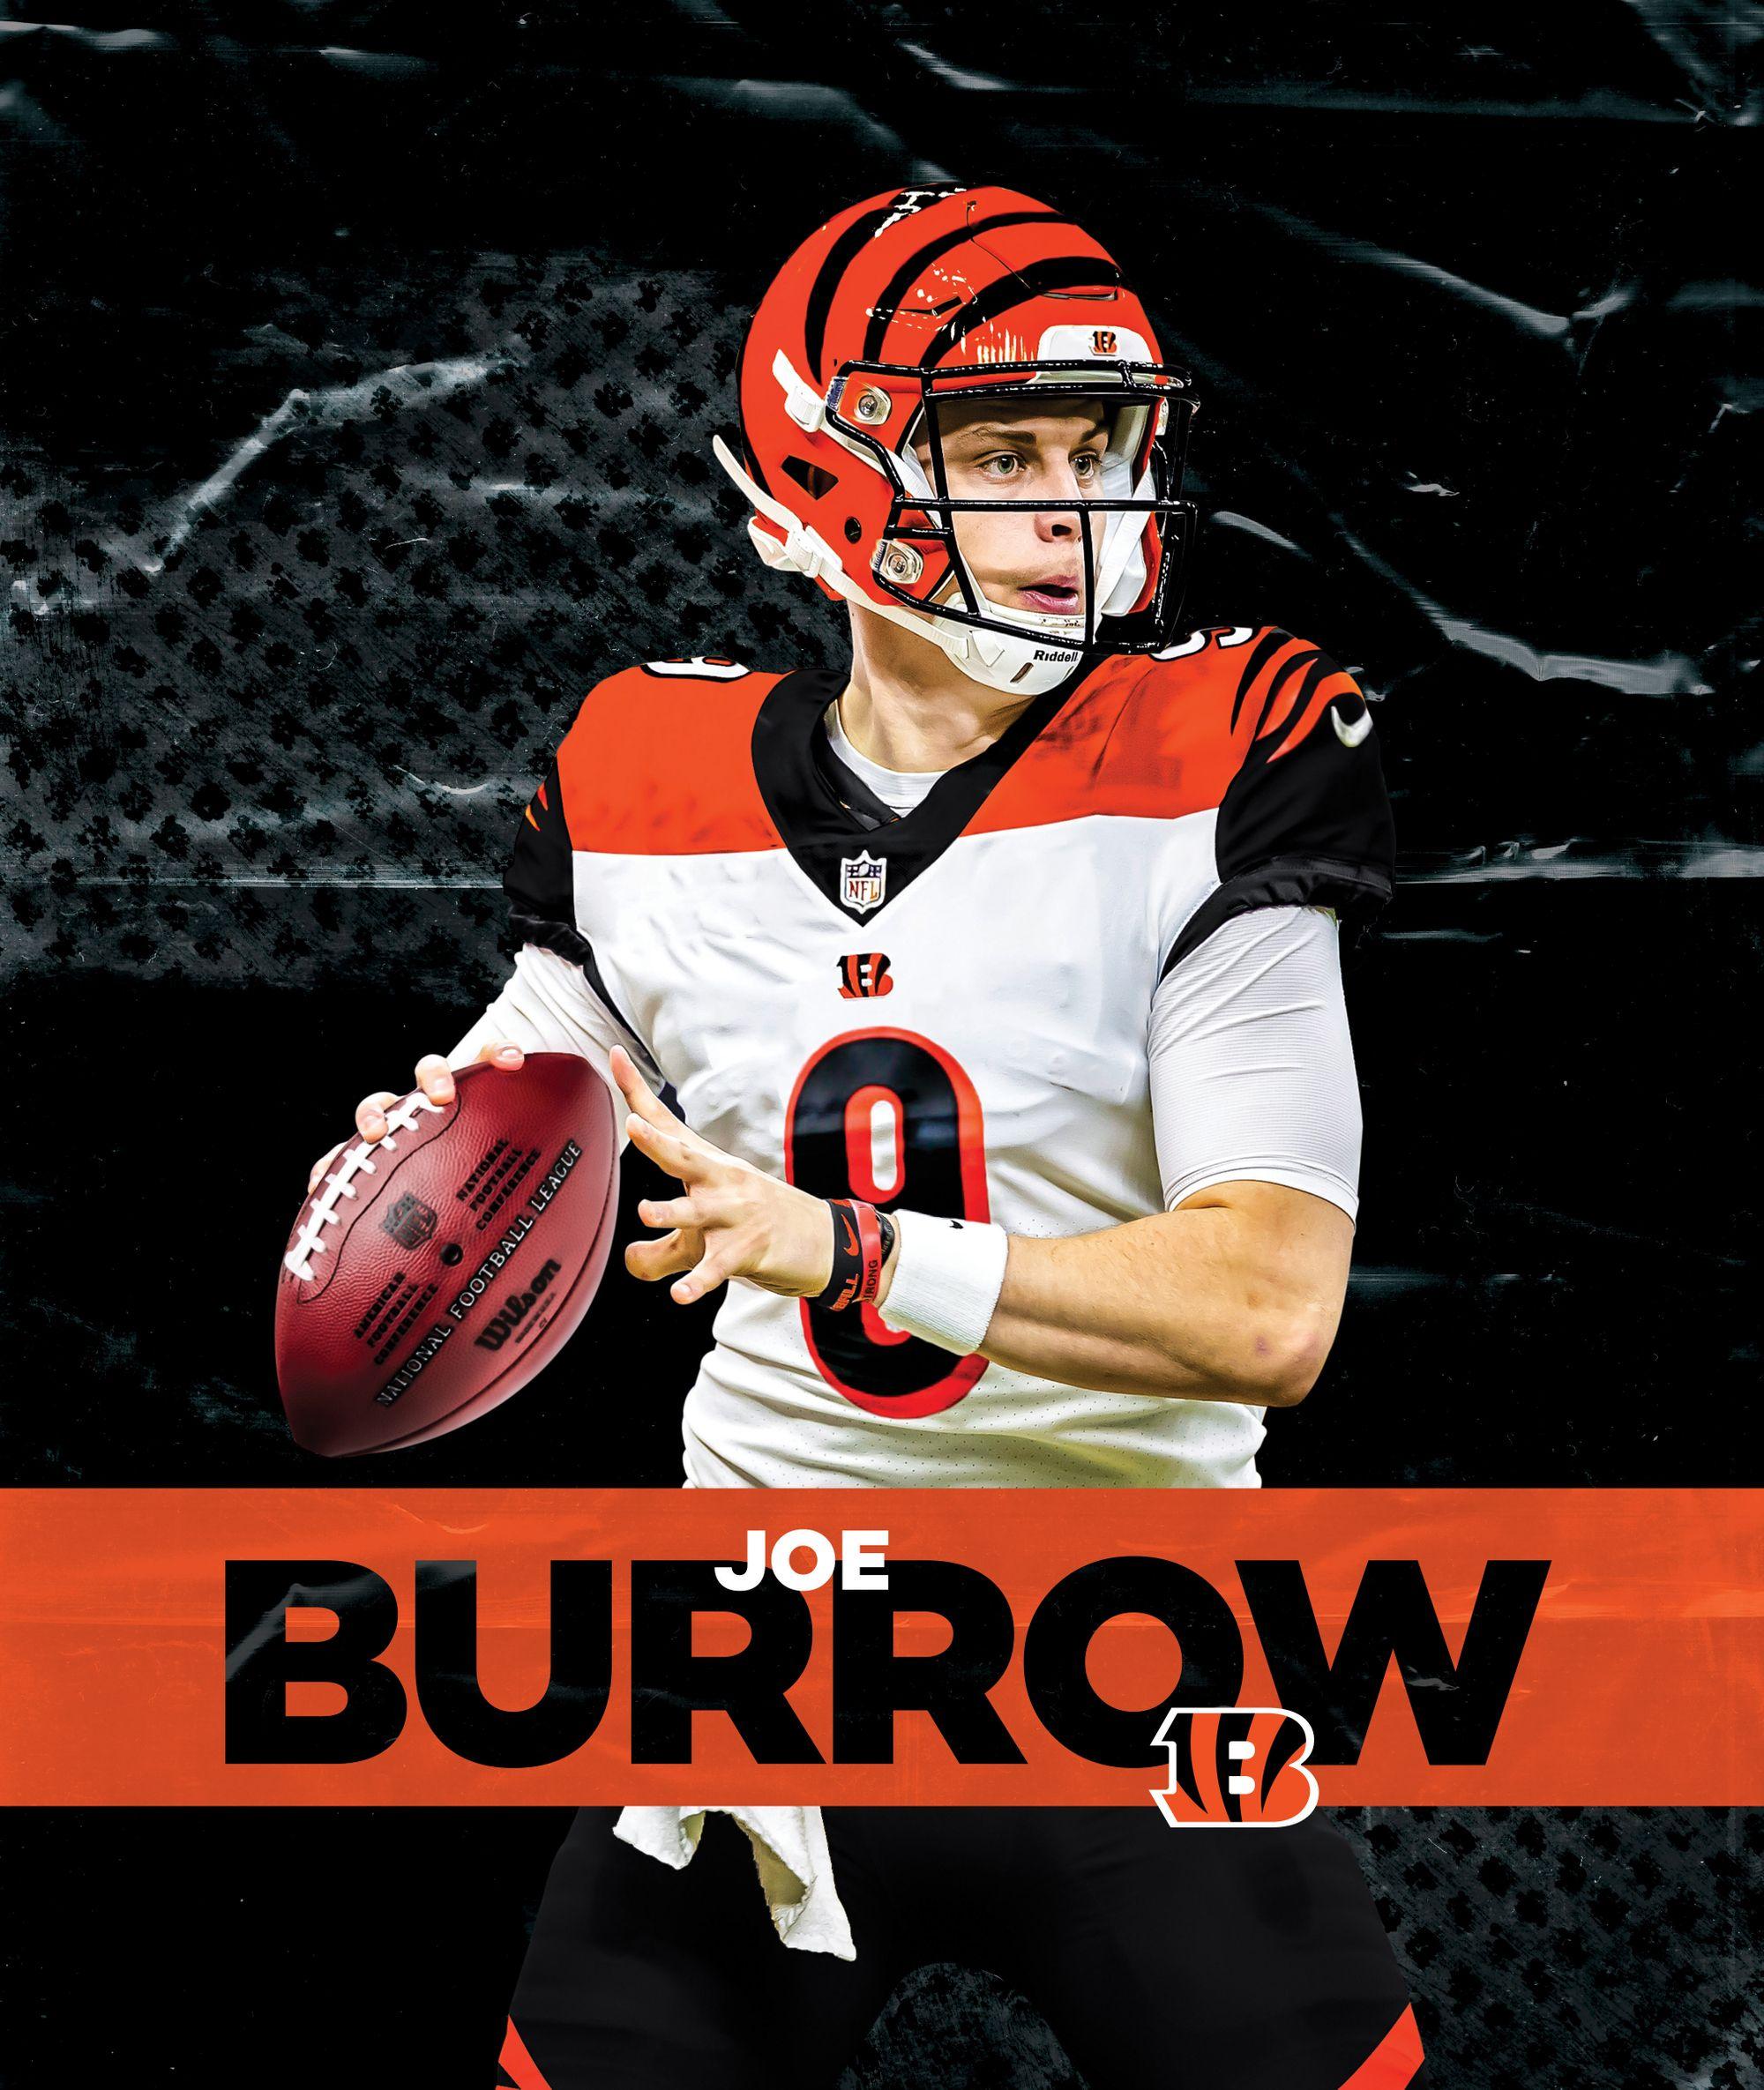 joe burrow lsu football